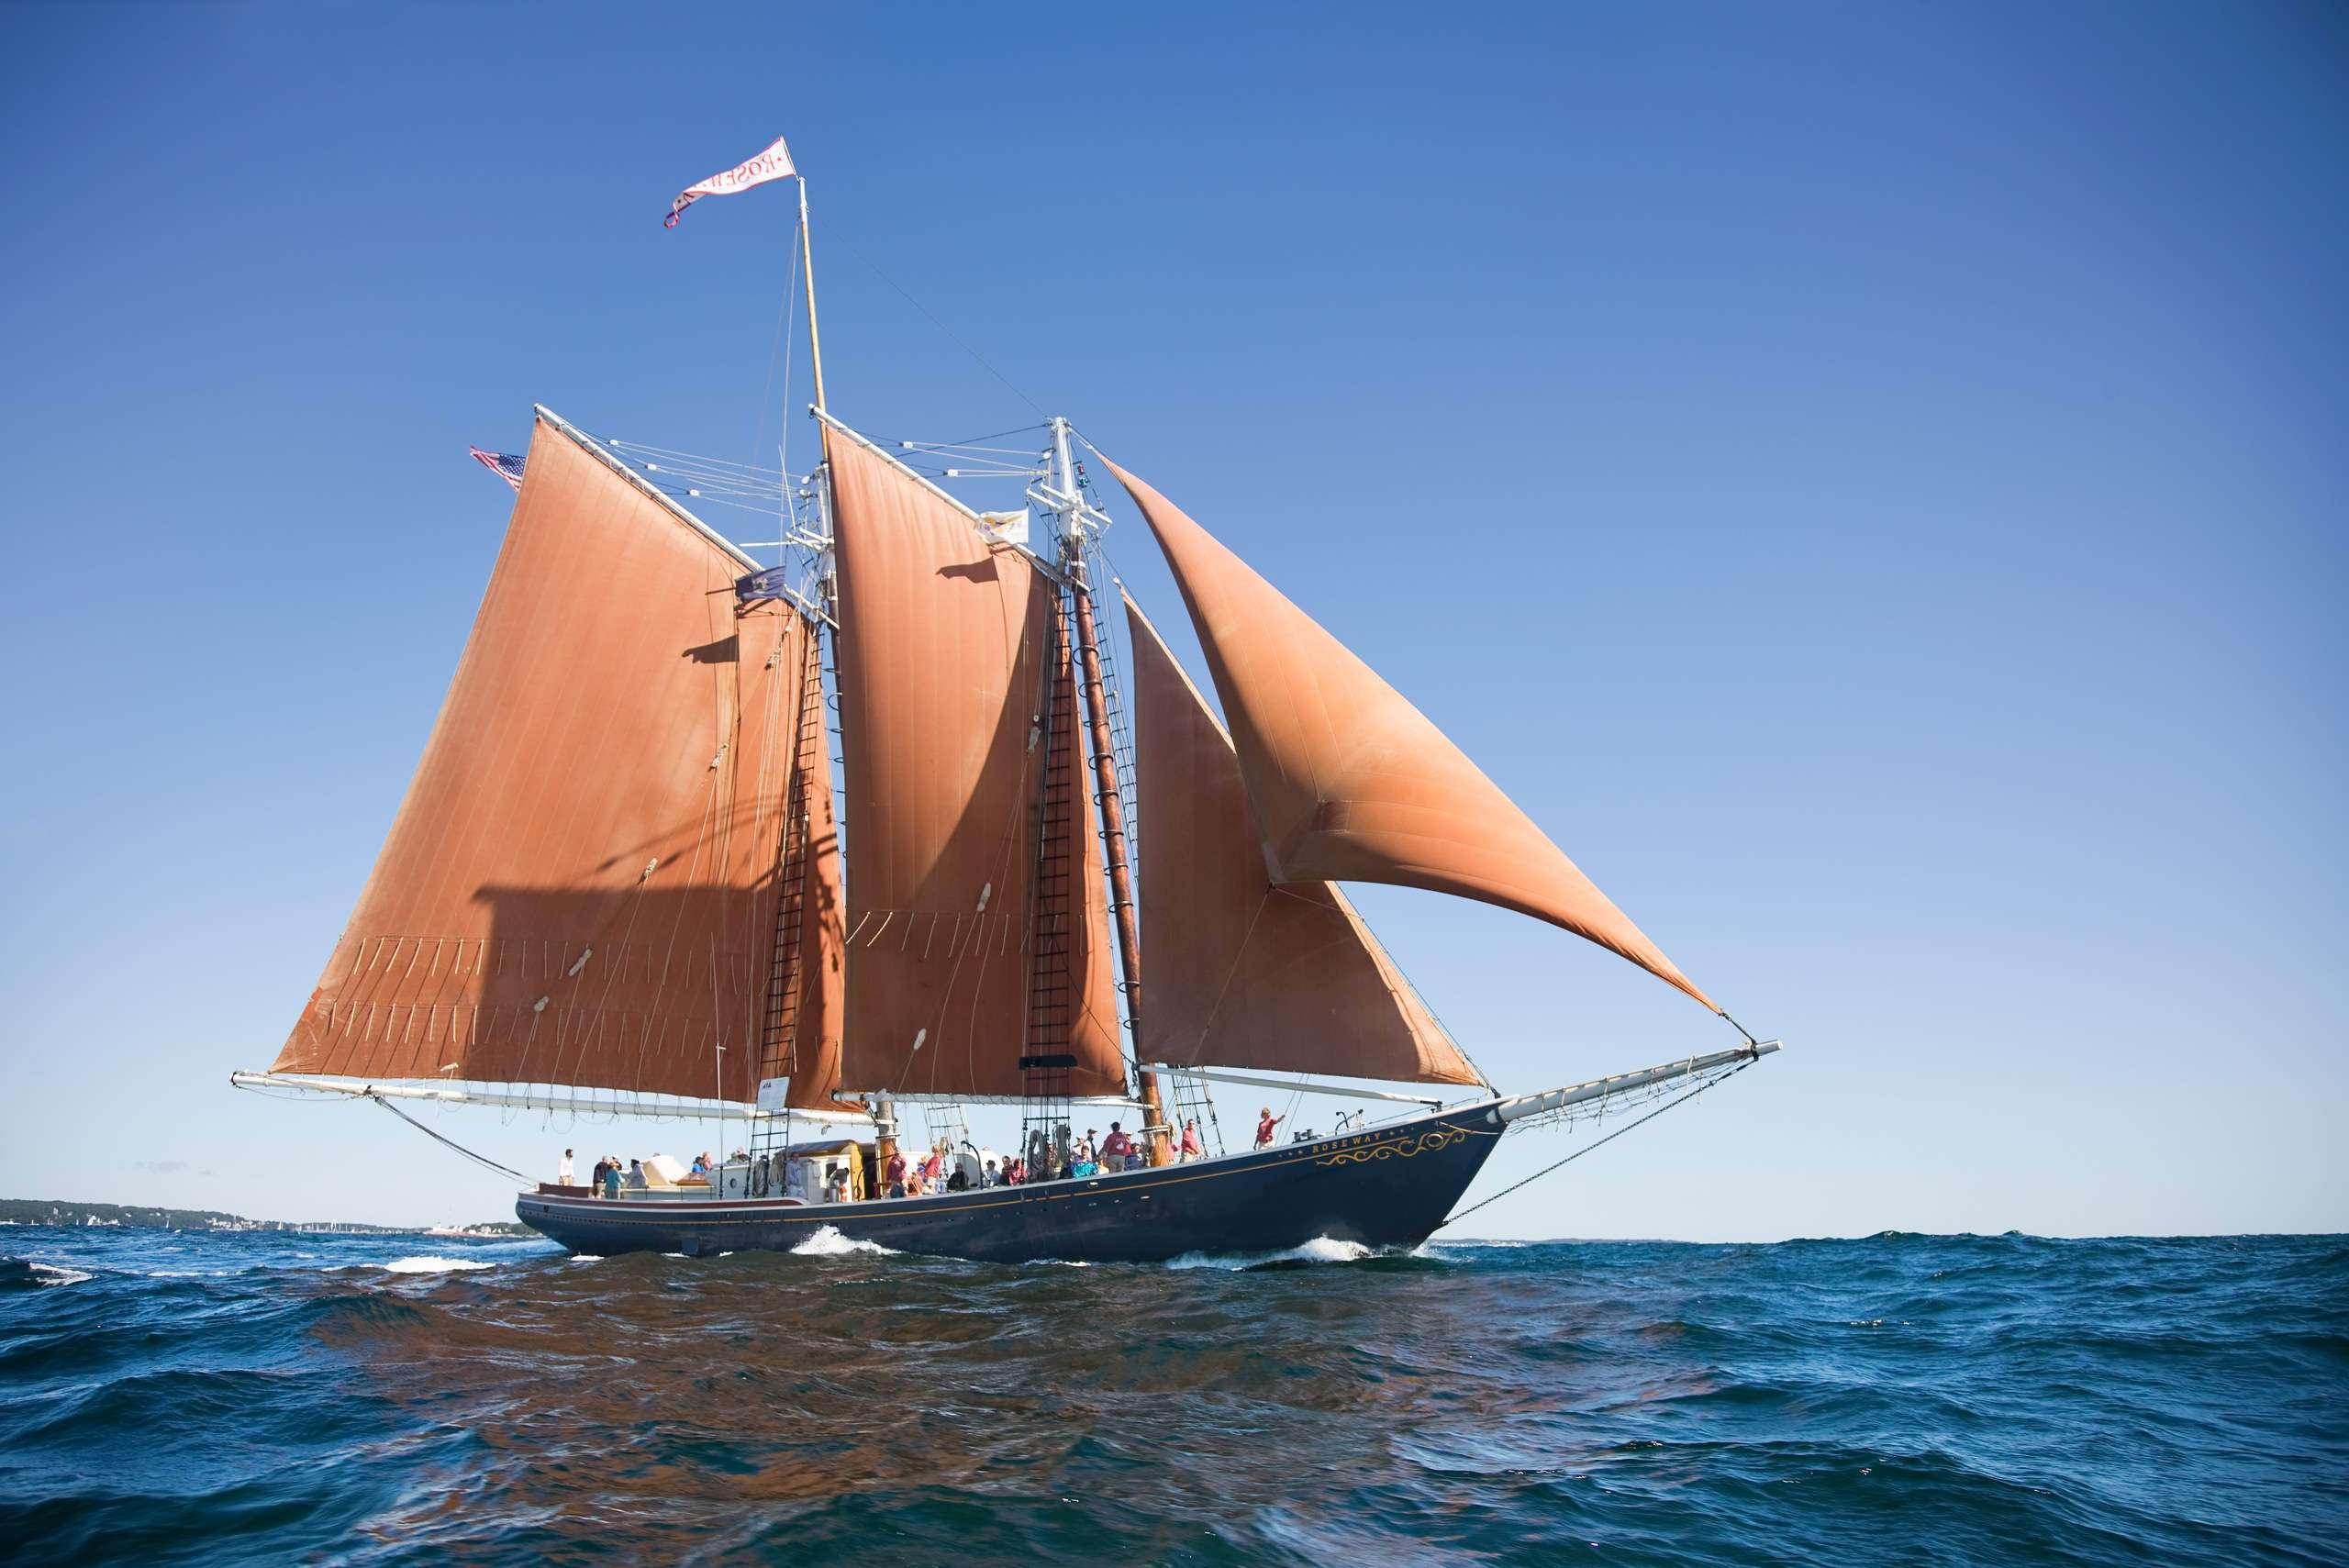 PORTFOLIO - Sailing - Windjammers #18   PCG458